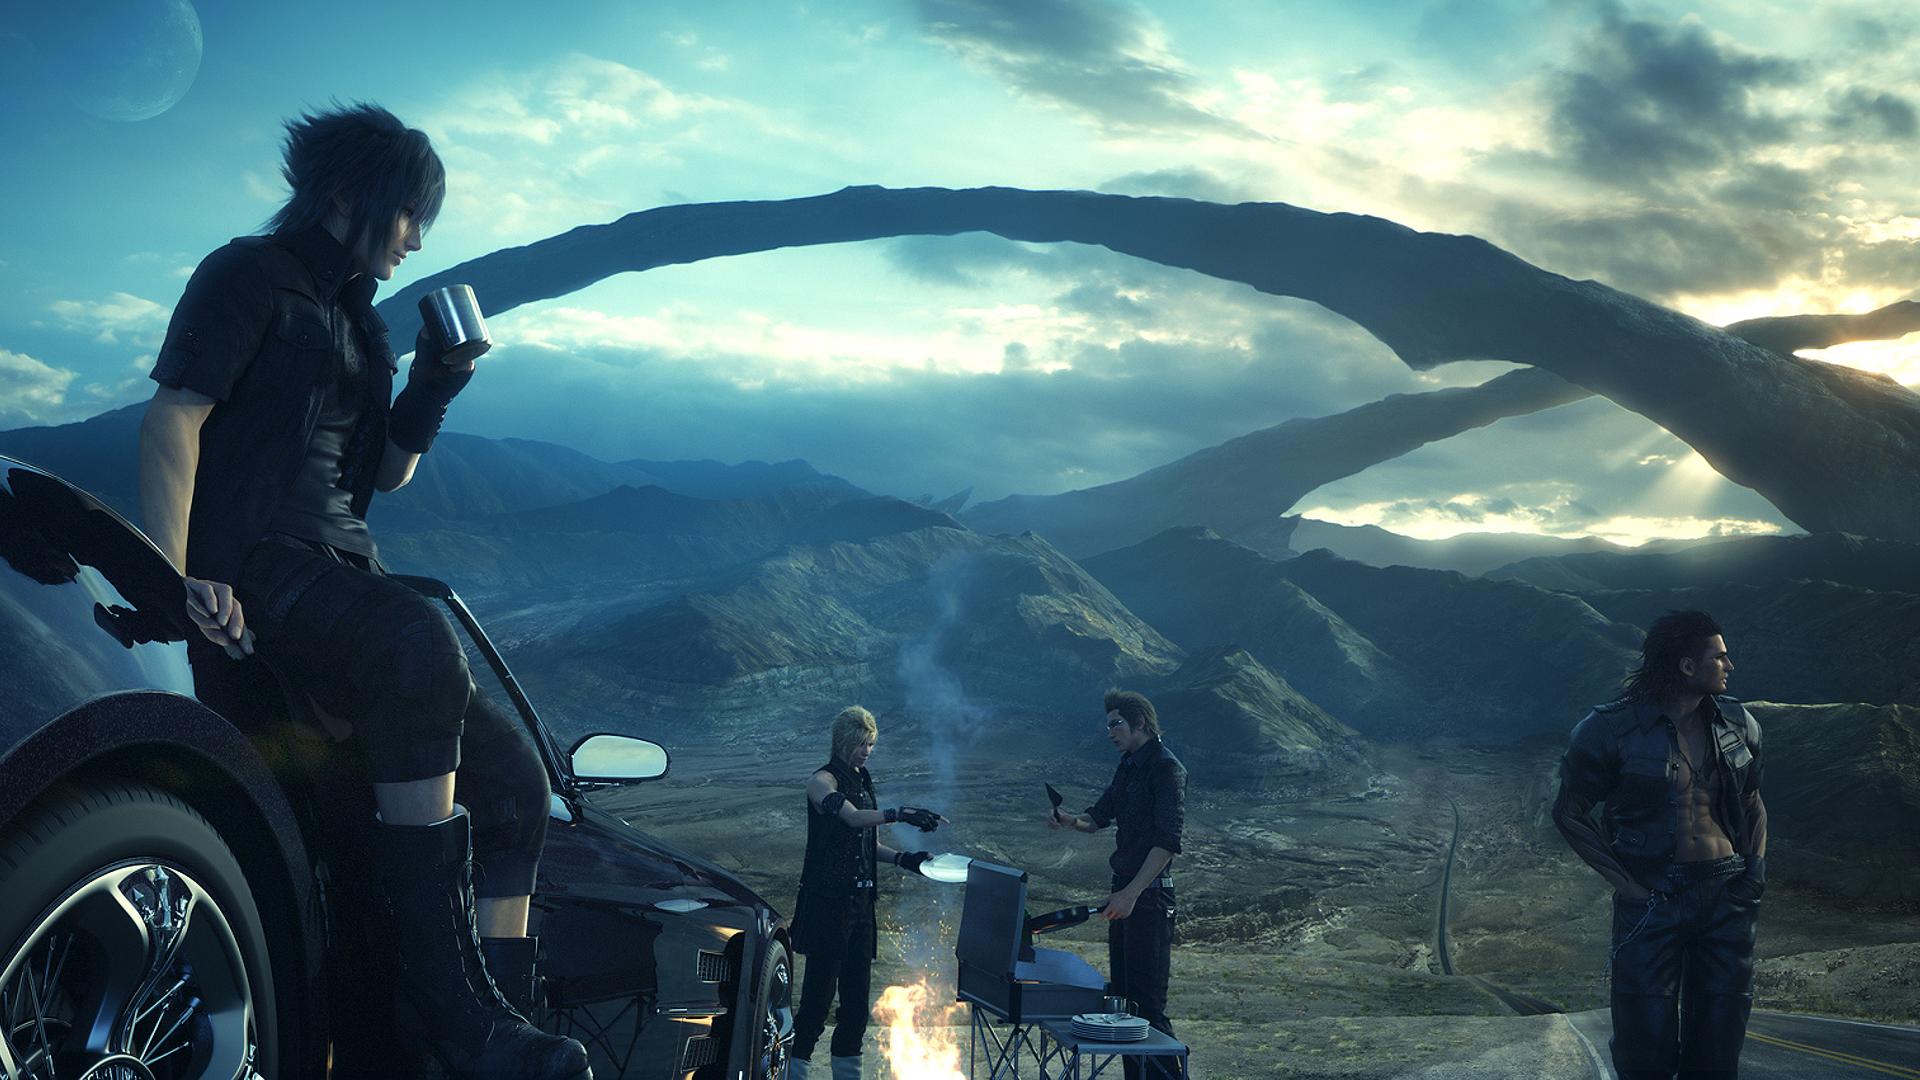 Final Fantasy 15 Episode Duscae Demo Exploration Feature